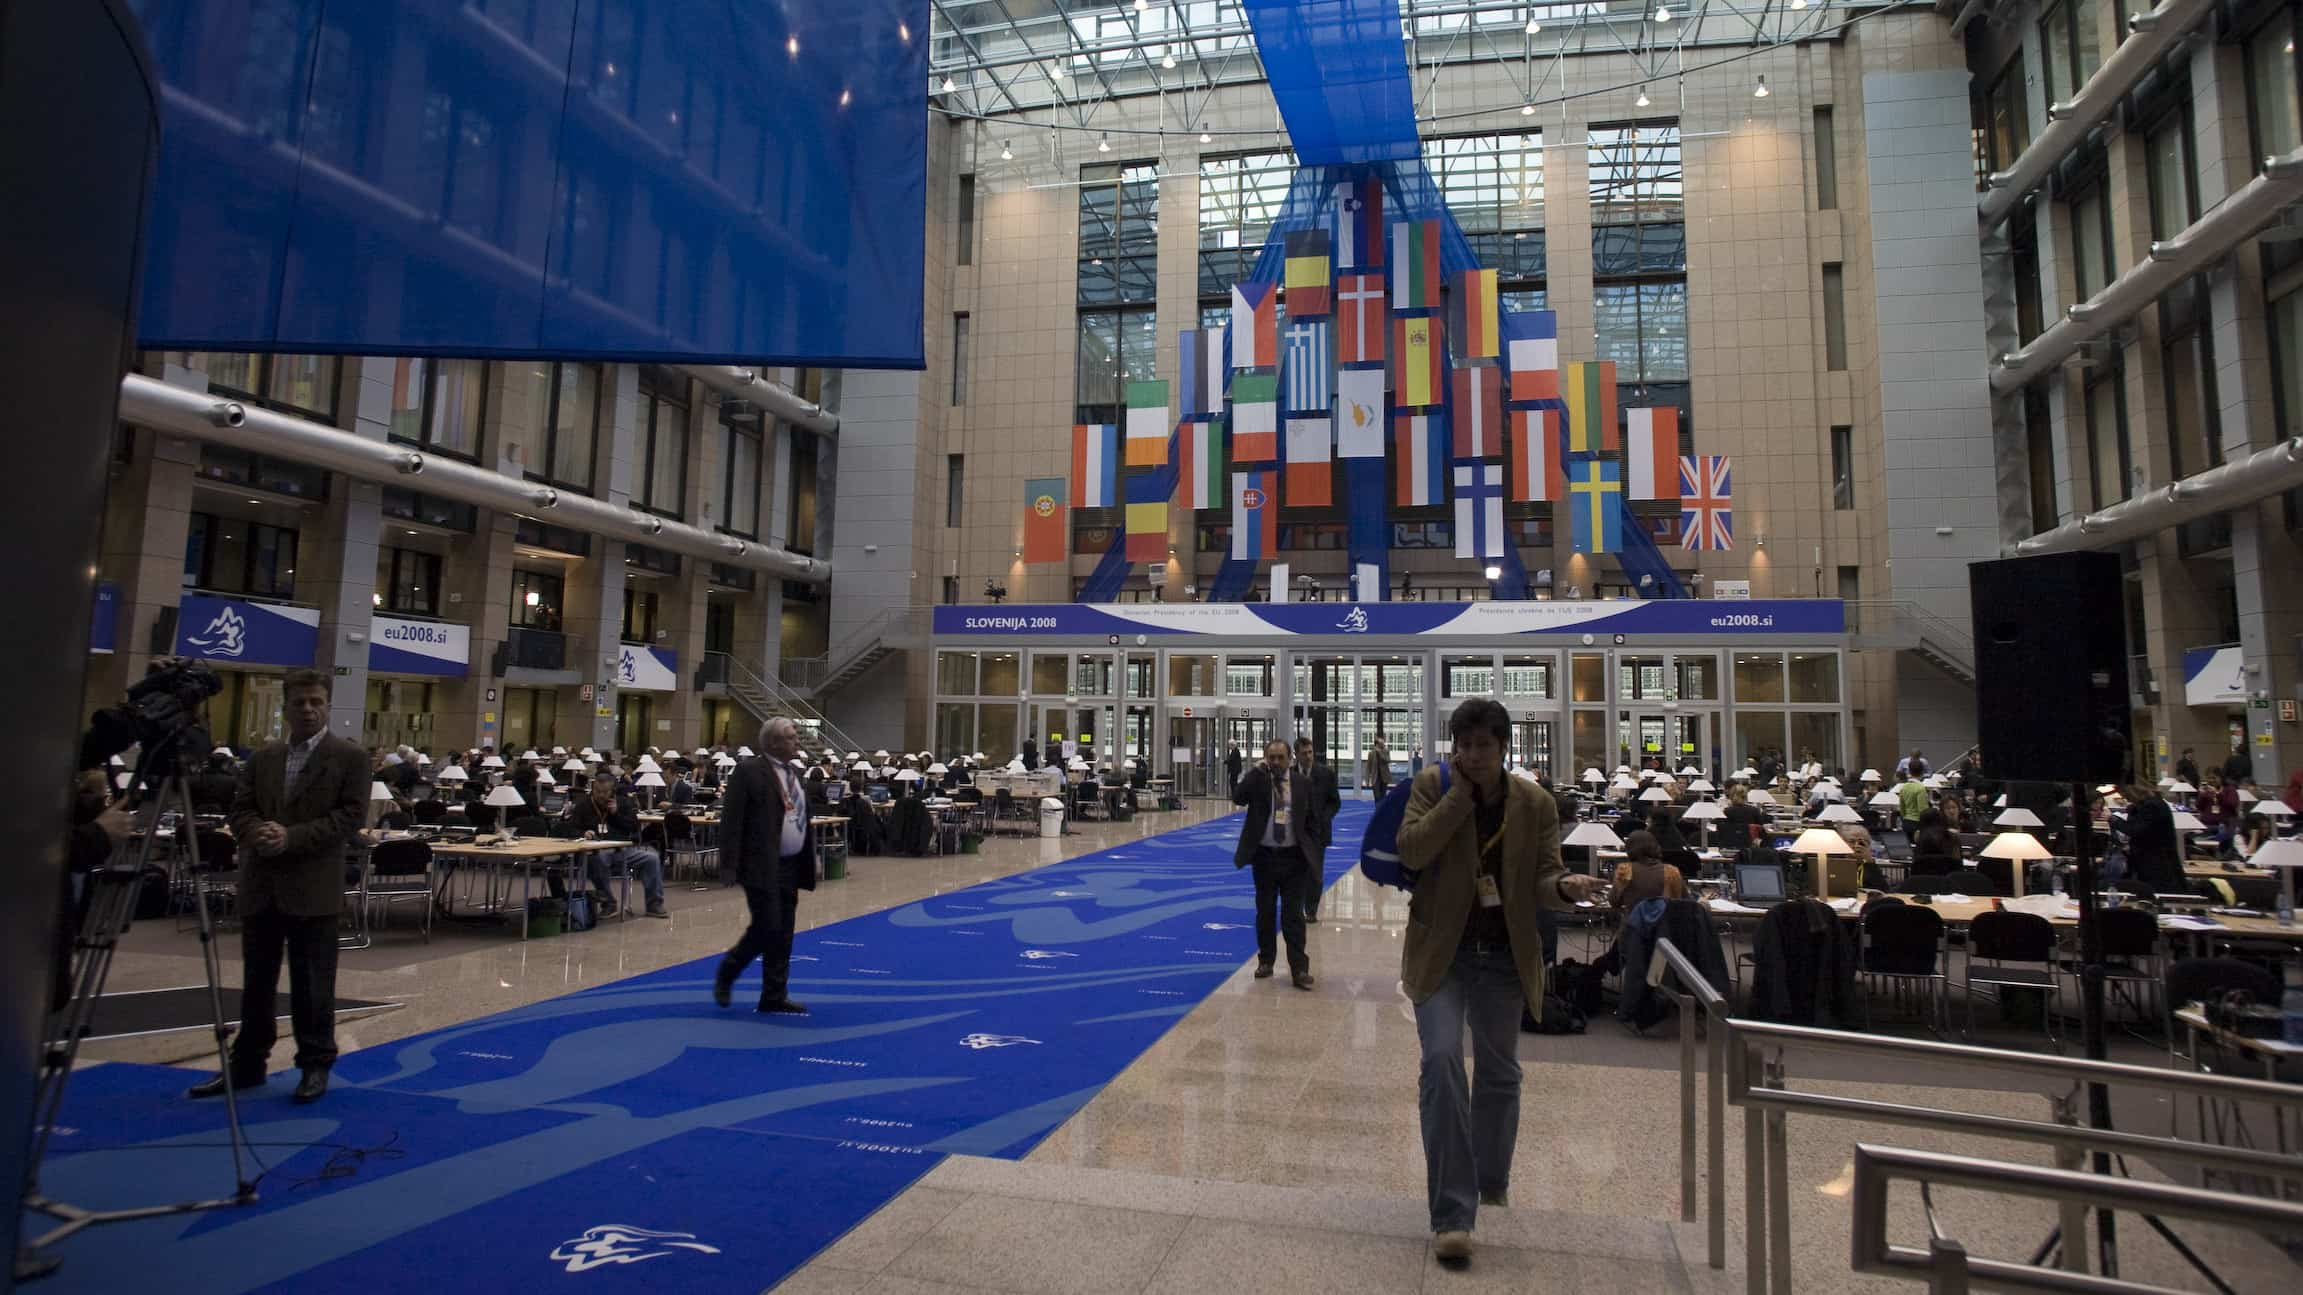 Marco Zullo M5S Europa intrighi lobby potere bruxelles